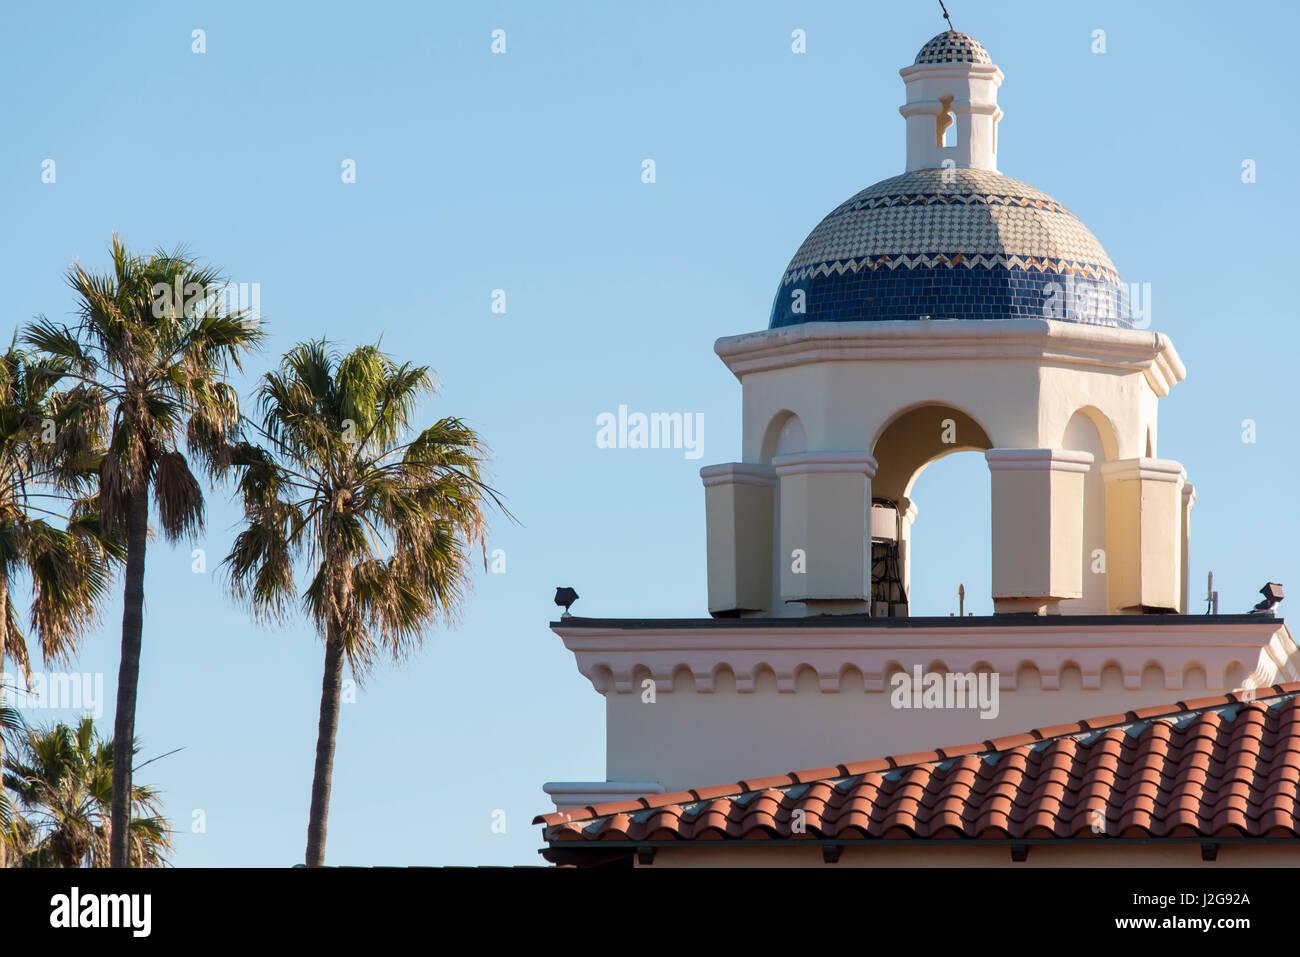 California mission style architecture - Usa California Oxnard Mandalay Beach Resort Hotel Mission Style Architecture